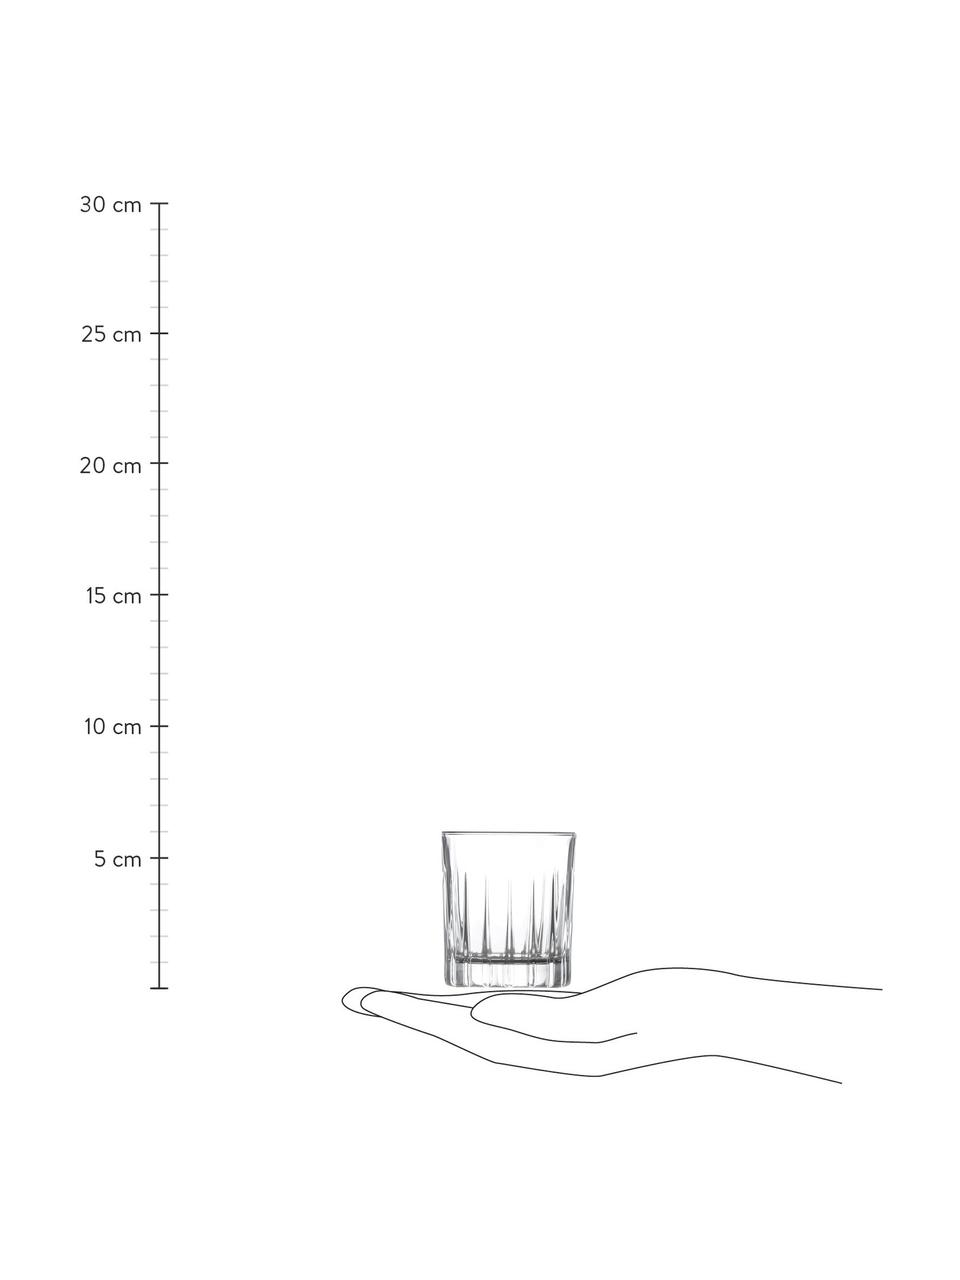 Borrelglaasjes Timeless met groefreliëf, 6 stuks, Luxion kristalglas, Transparant, Ø 5 x H 6 cm